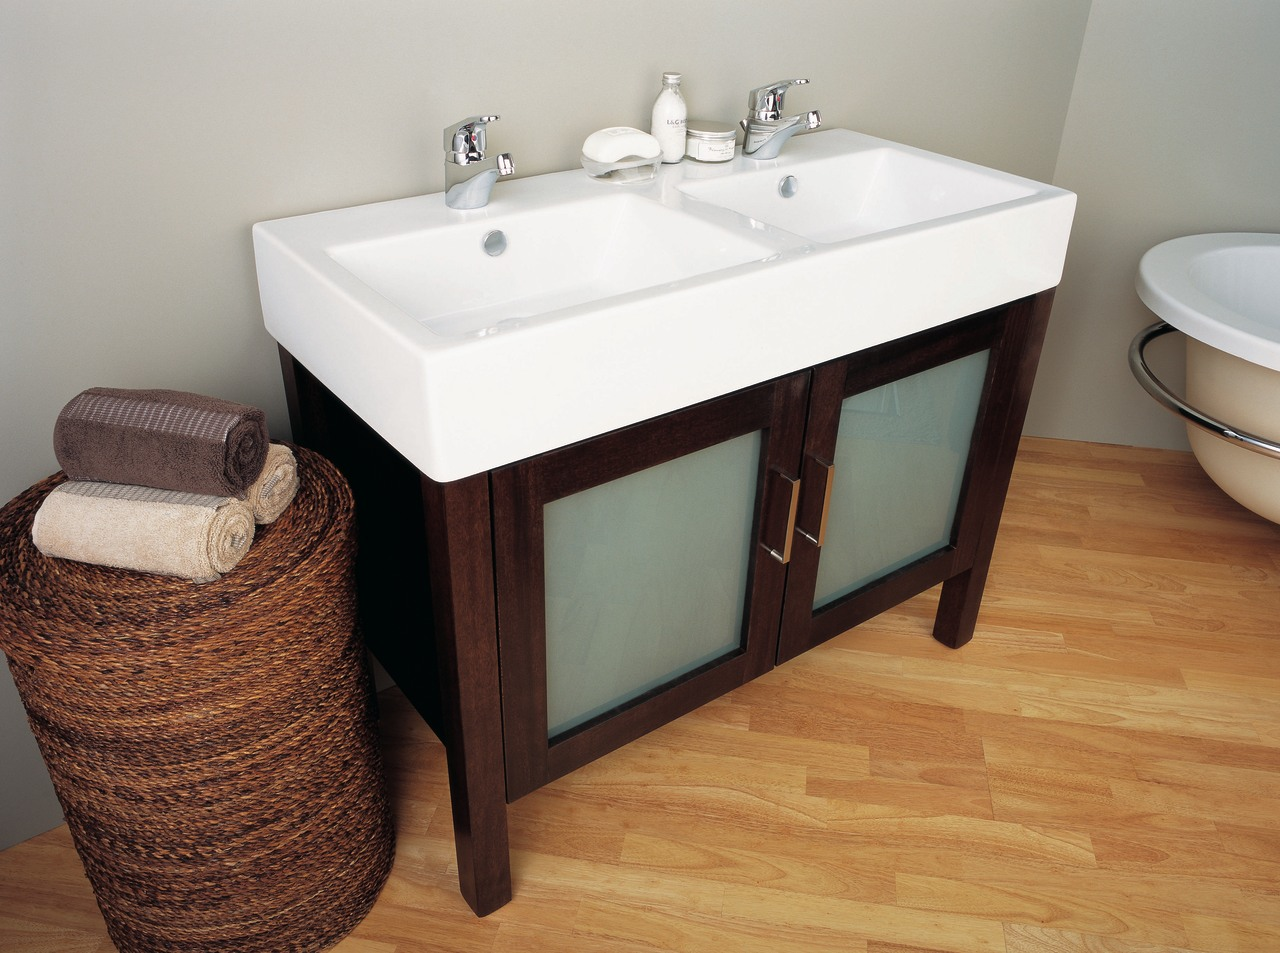 The detail of a dual basin bathroom, bathroom accessory, bathroom cabinet, bathroom sink, floor, flooring, furniture, hardwood, plumbing fixture, product, product design, room, sink, white